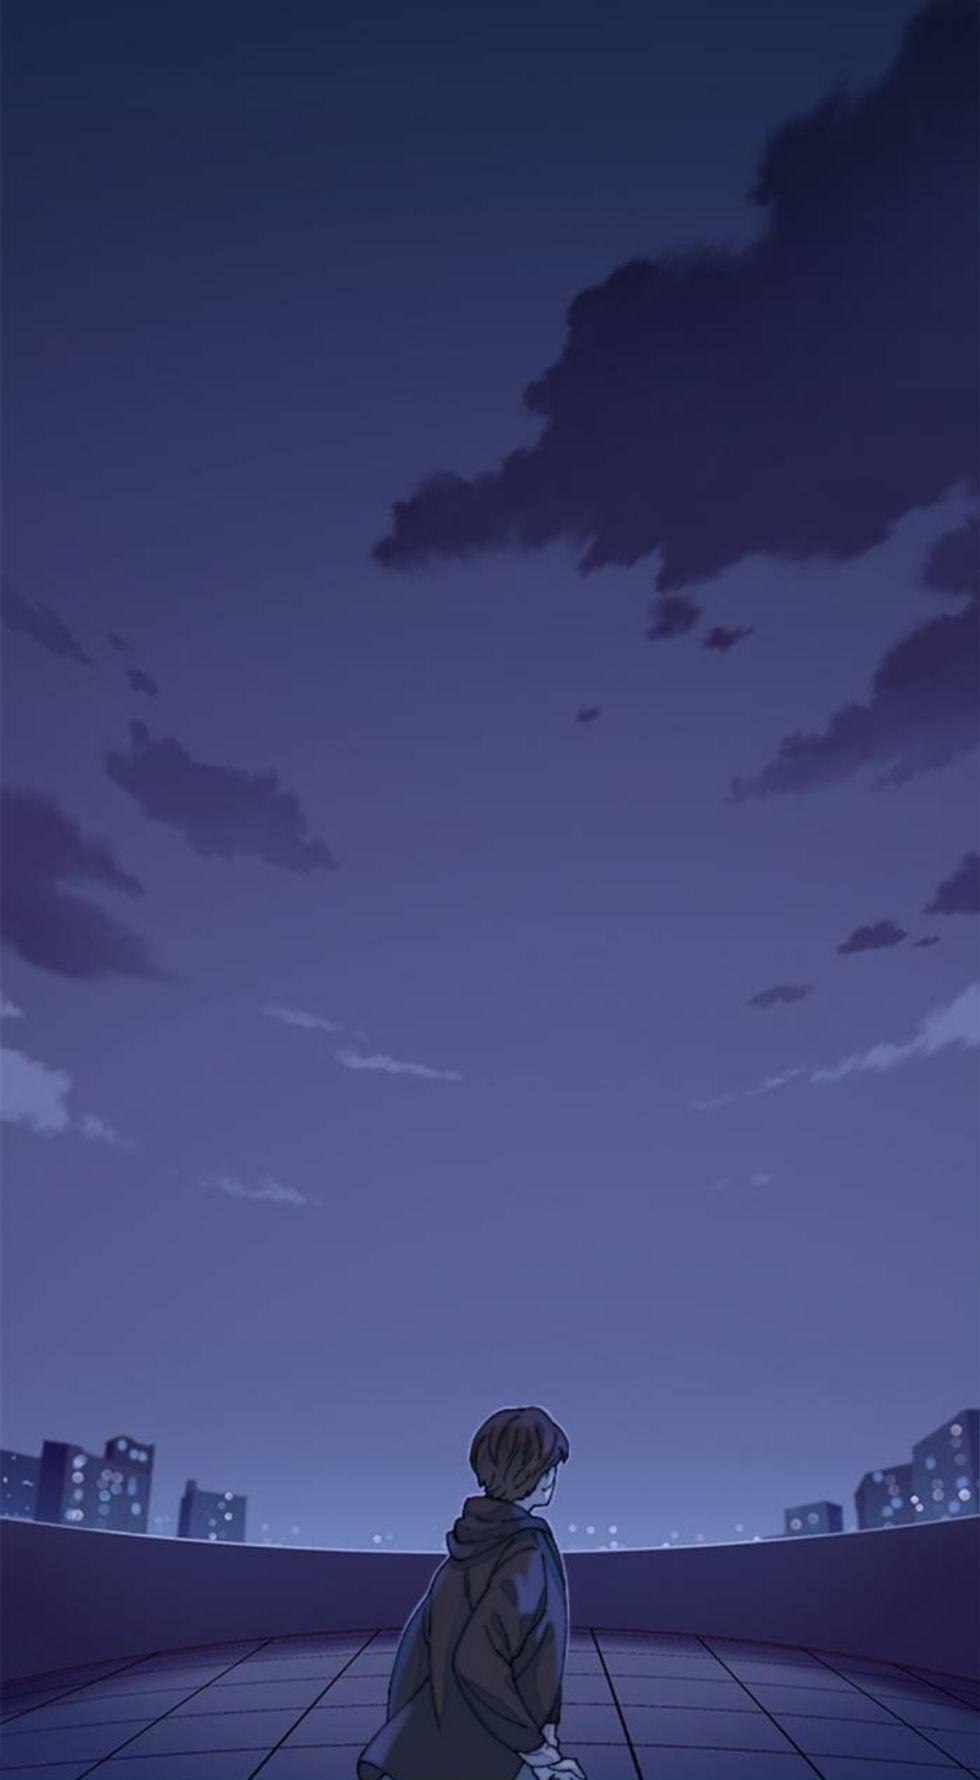 Save Me Fr Pemandangan Anime Pemandangan Abstrak Pemandangan